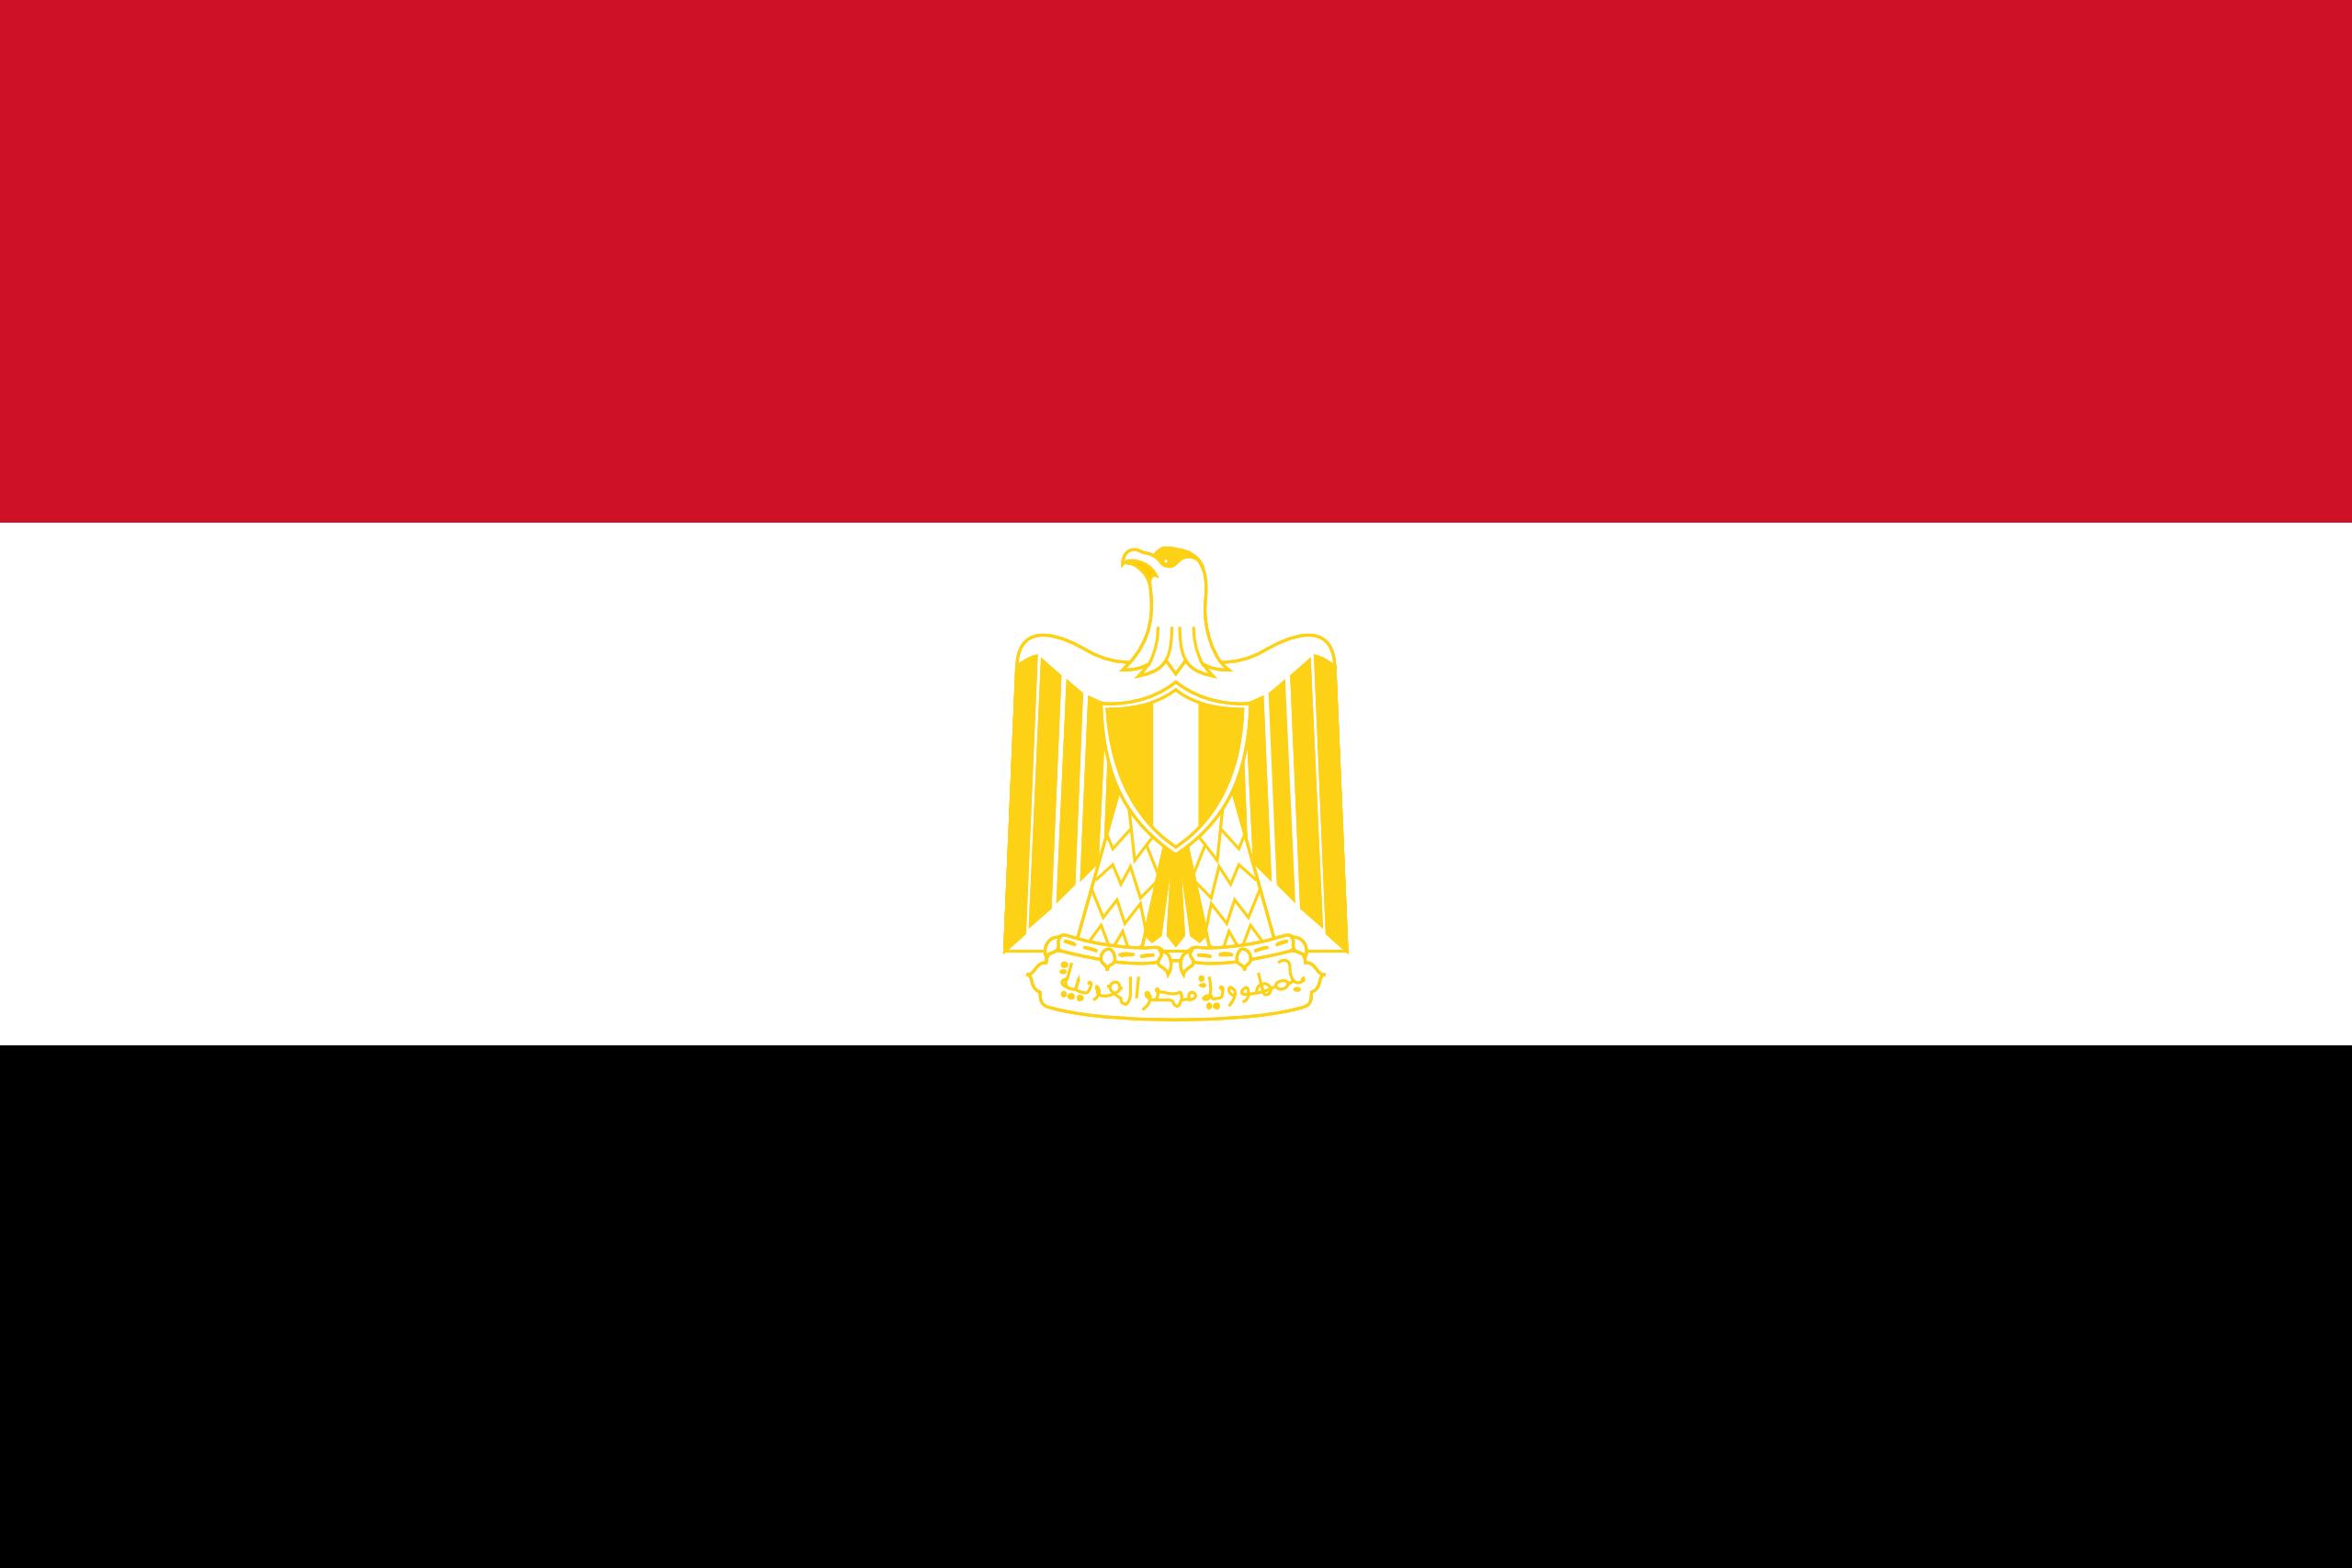 Egipto - bandera